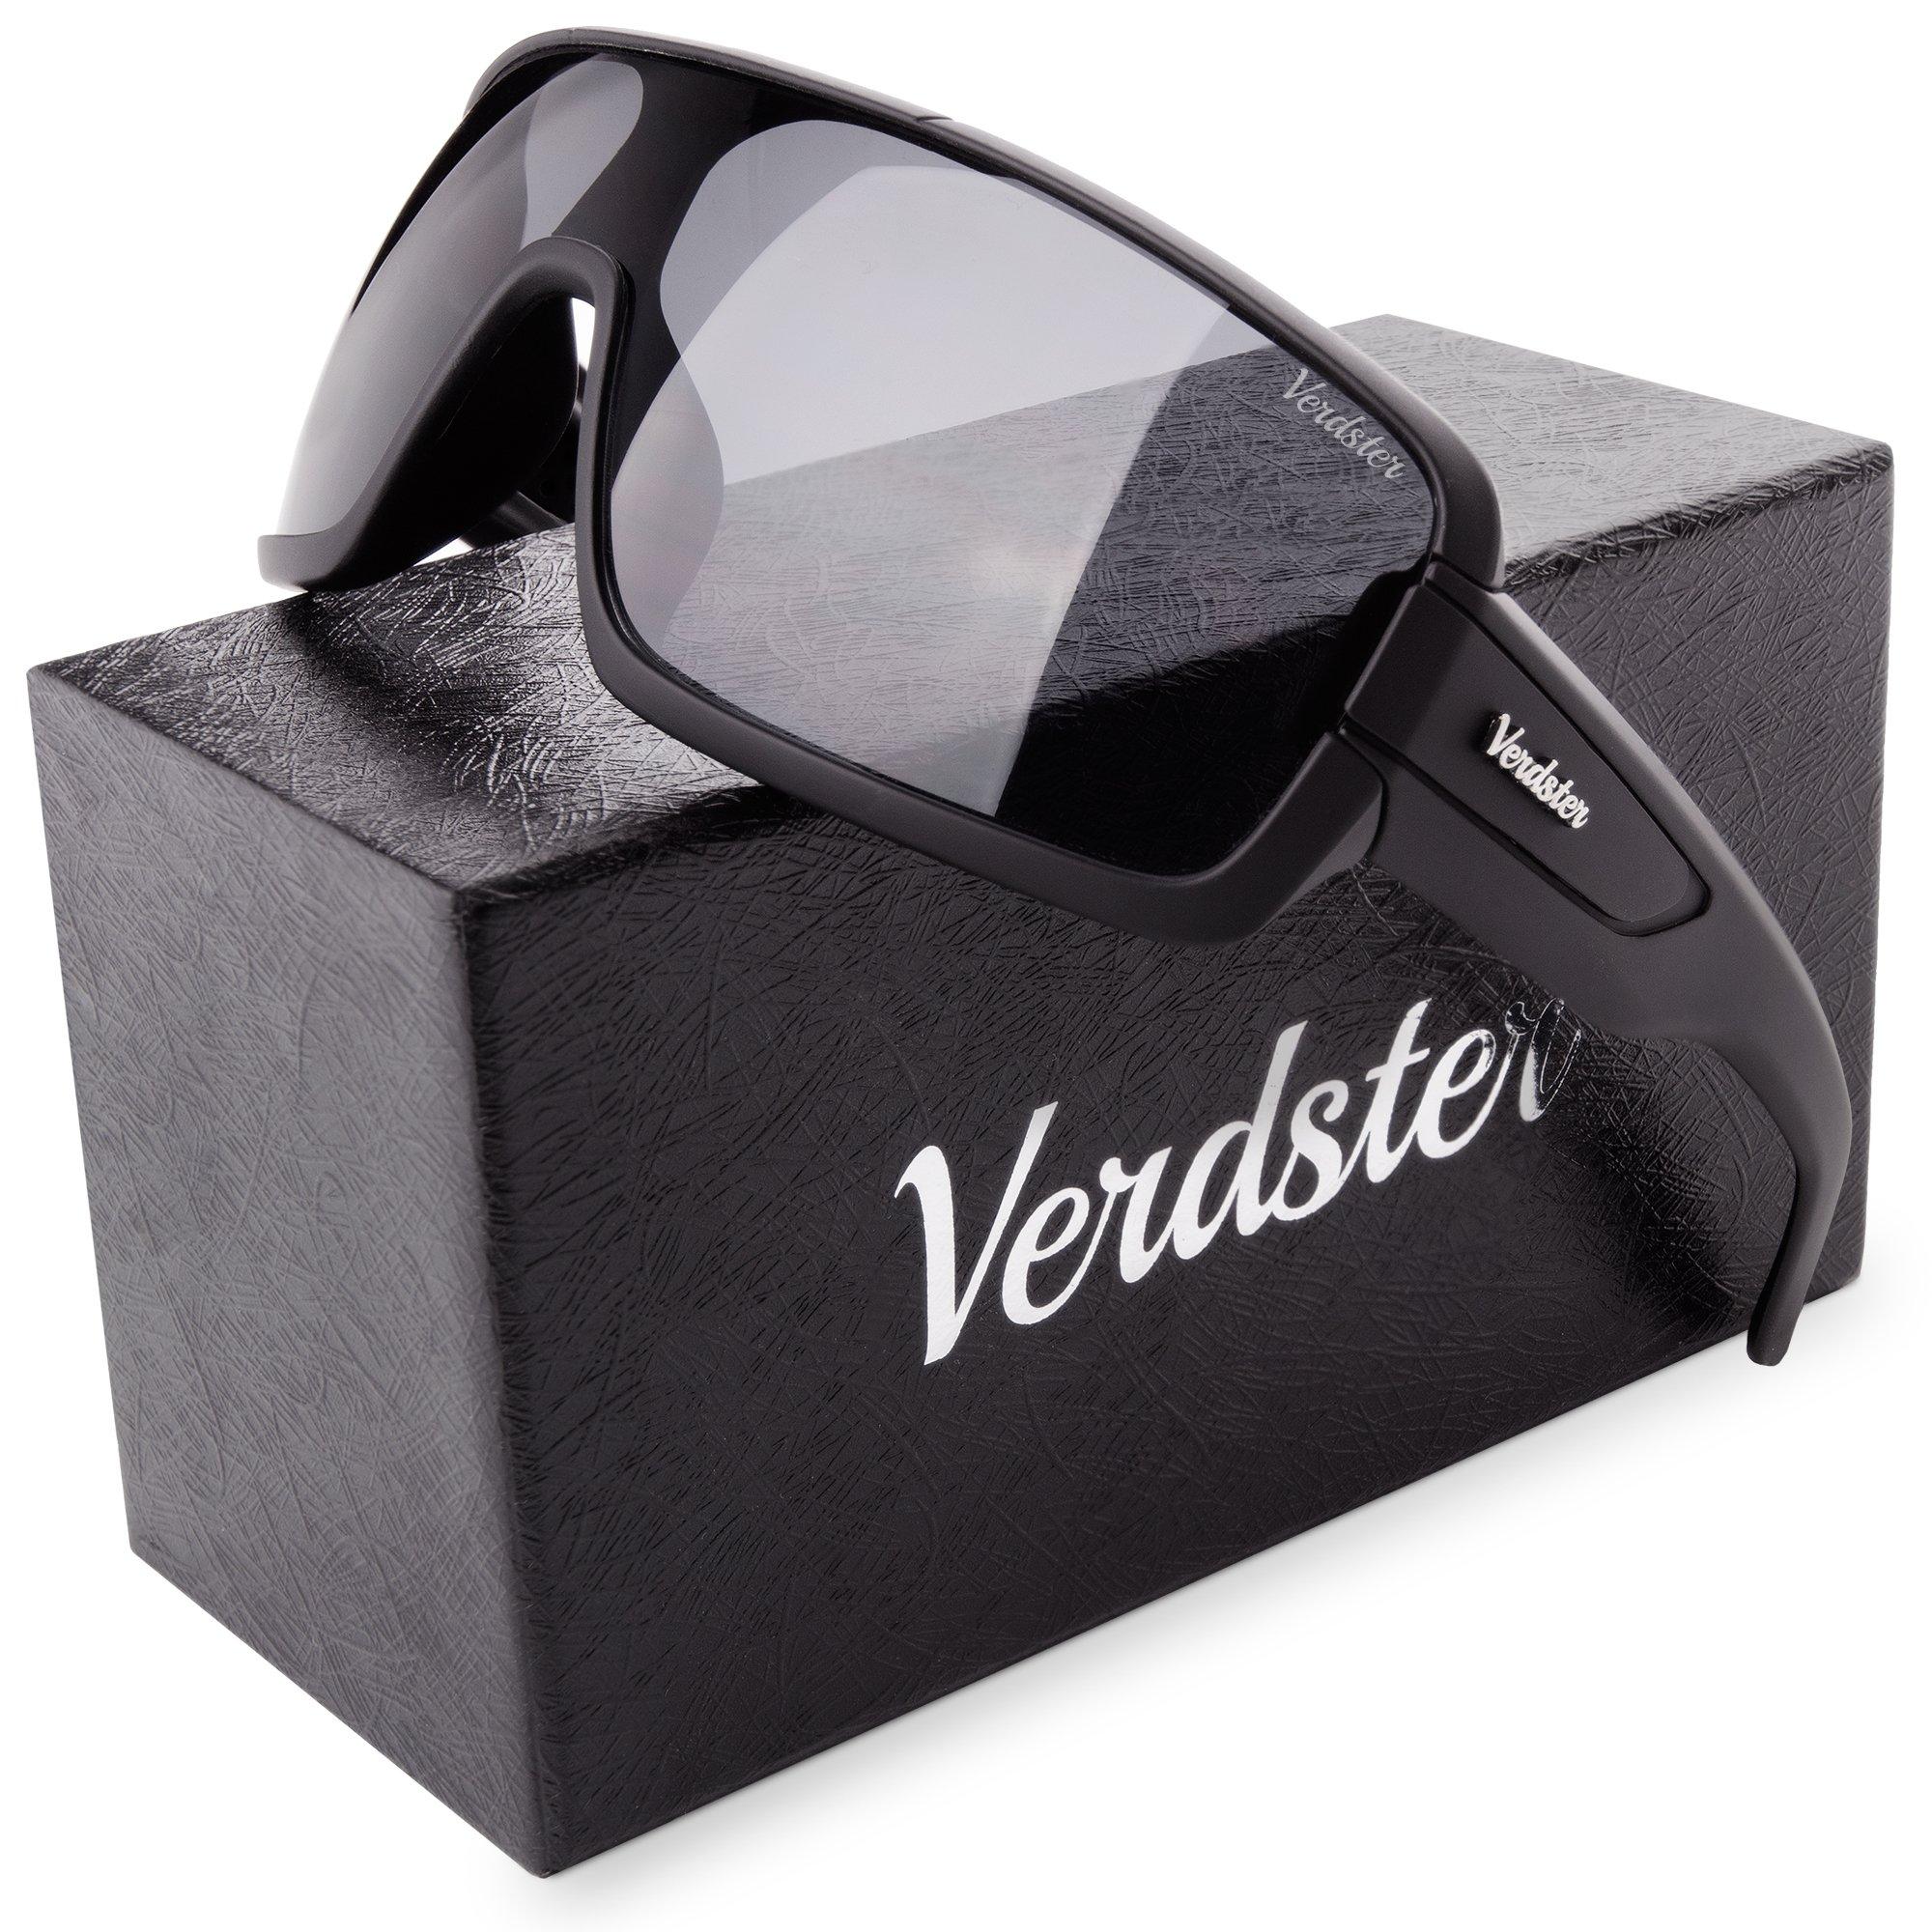 Verdster Casual Trendy Sunglasses Men Women, Accessories Case, Black Terminator Shades